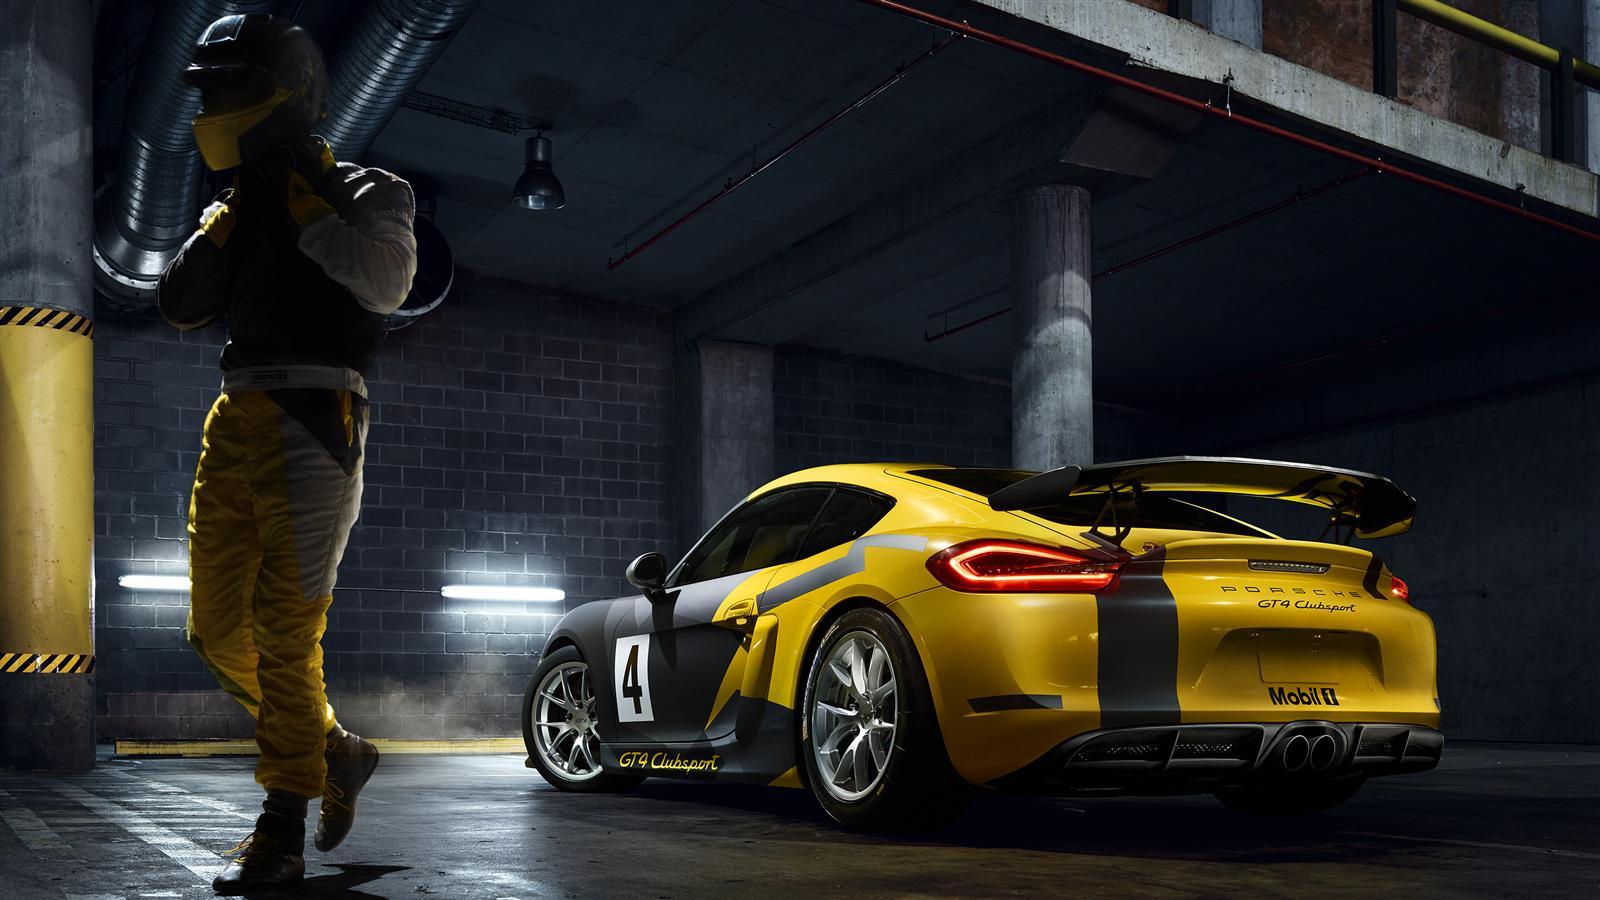 Porsche Cayman GT4 Clubsport - 2015 - profil arrière / rear side-face